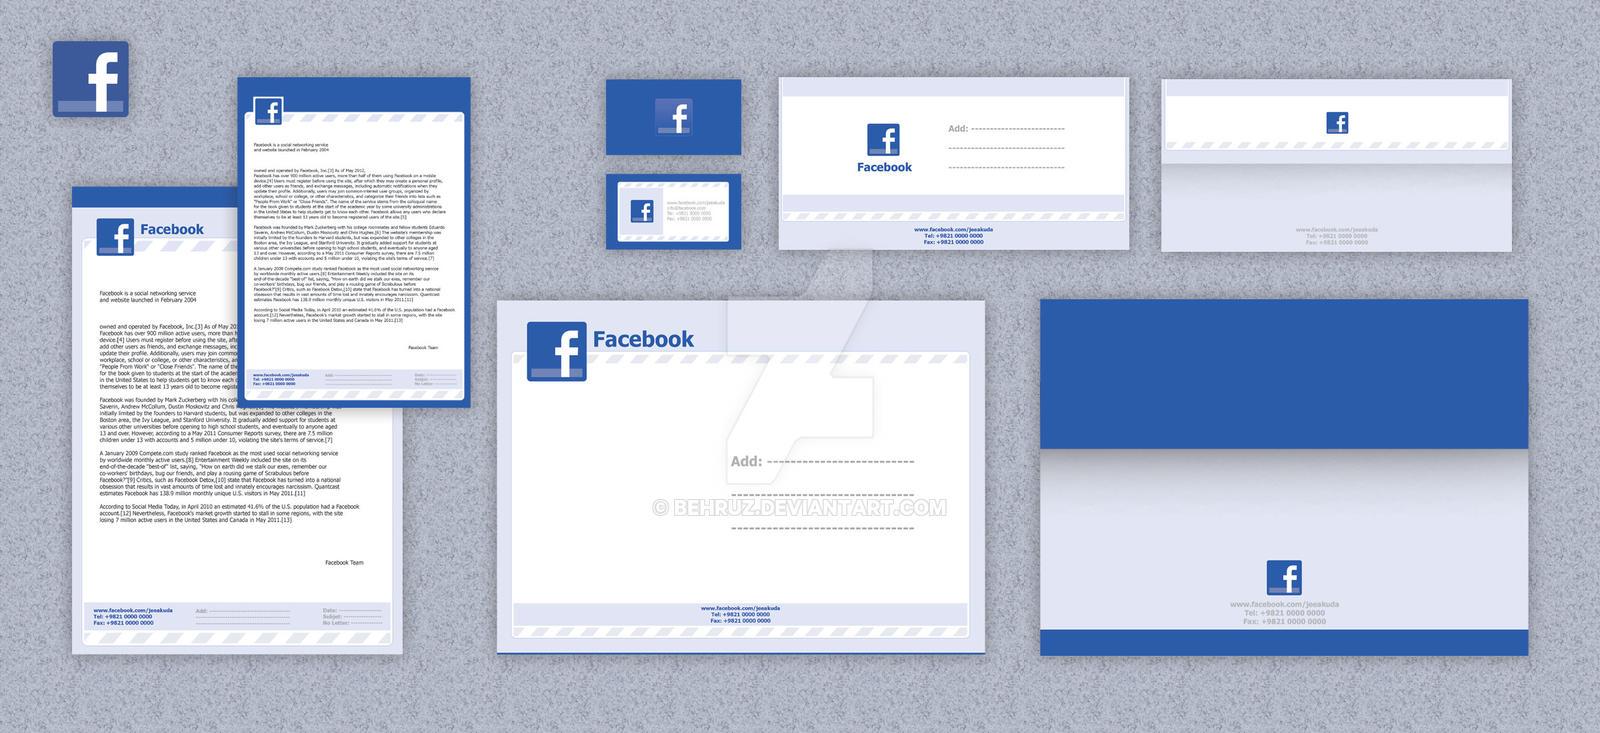 Facebook Letterhead design by behruz